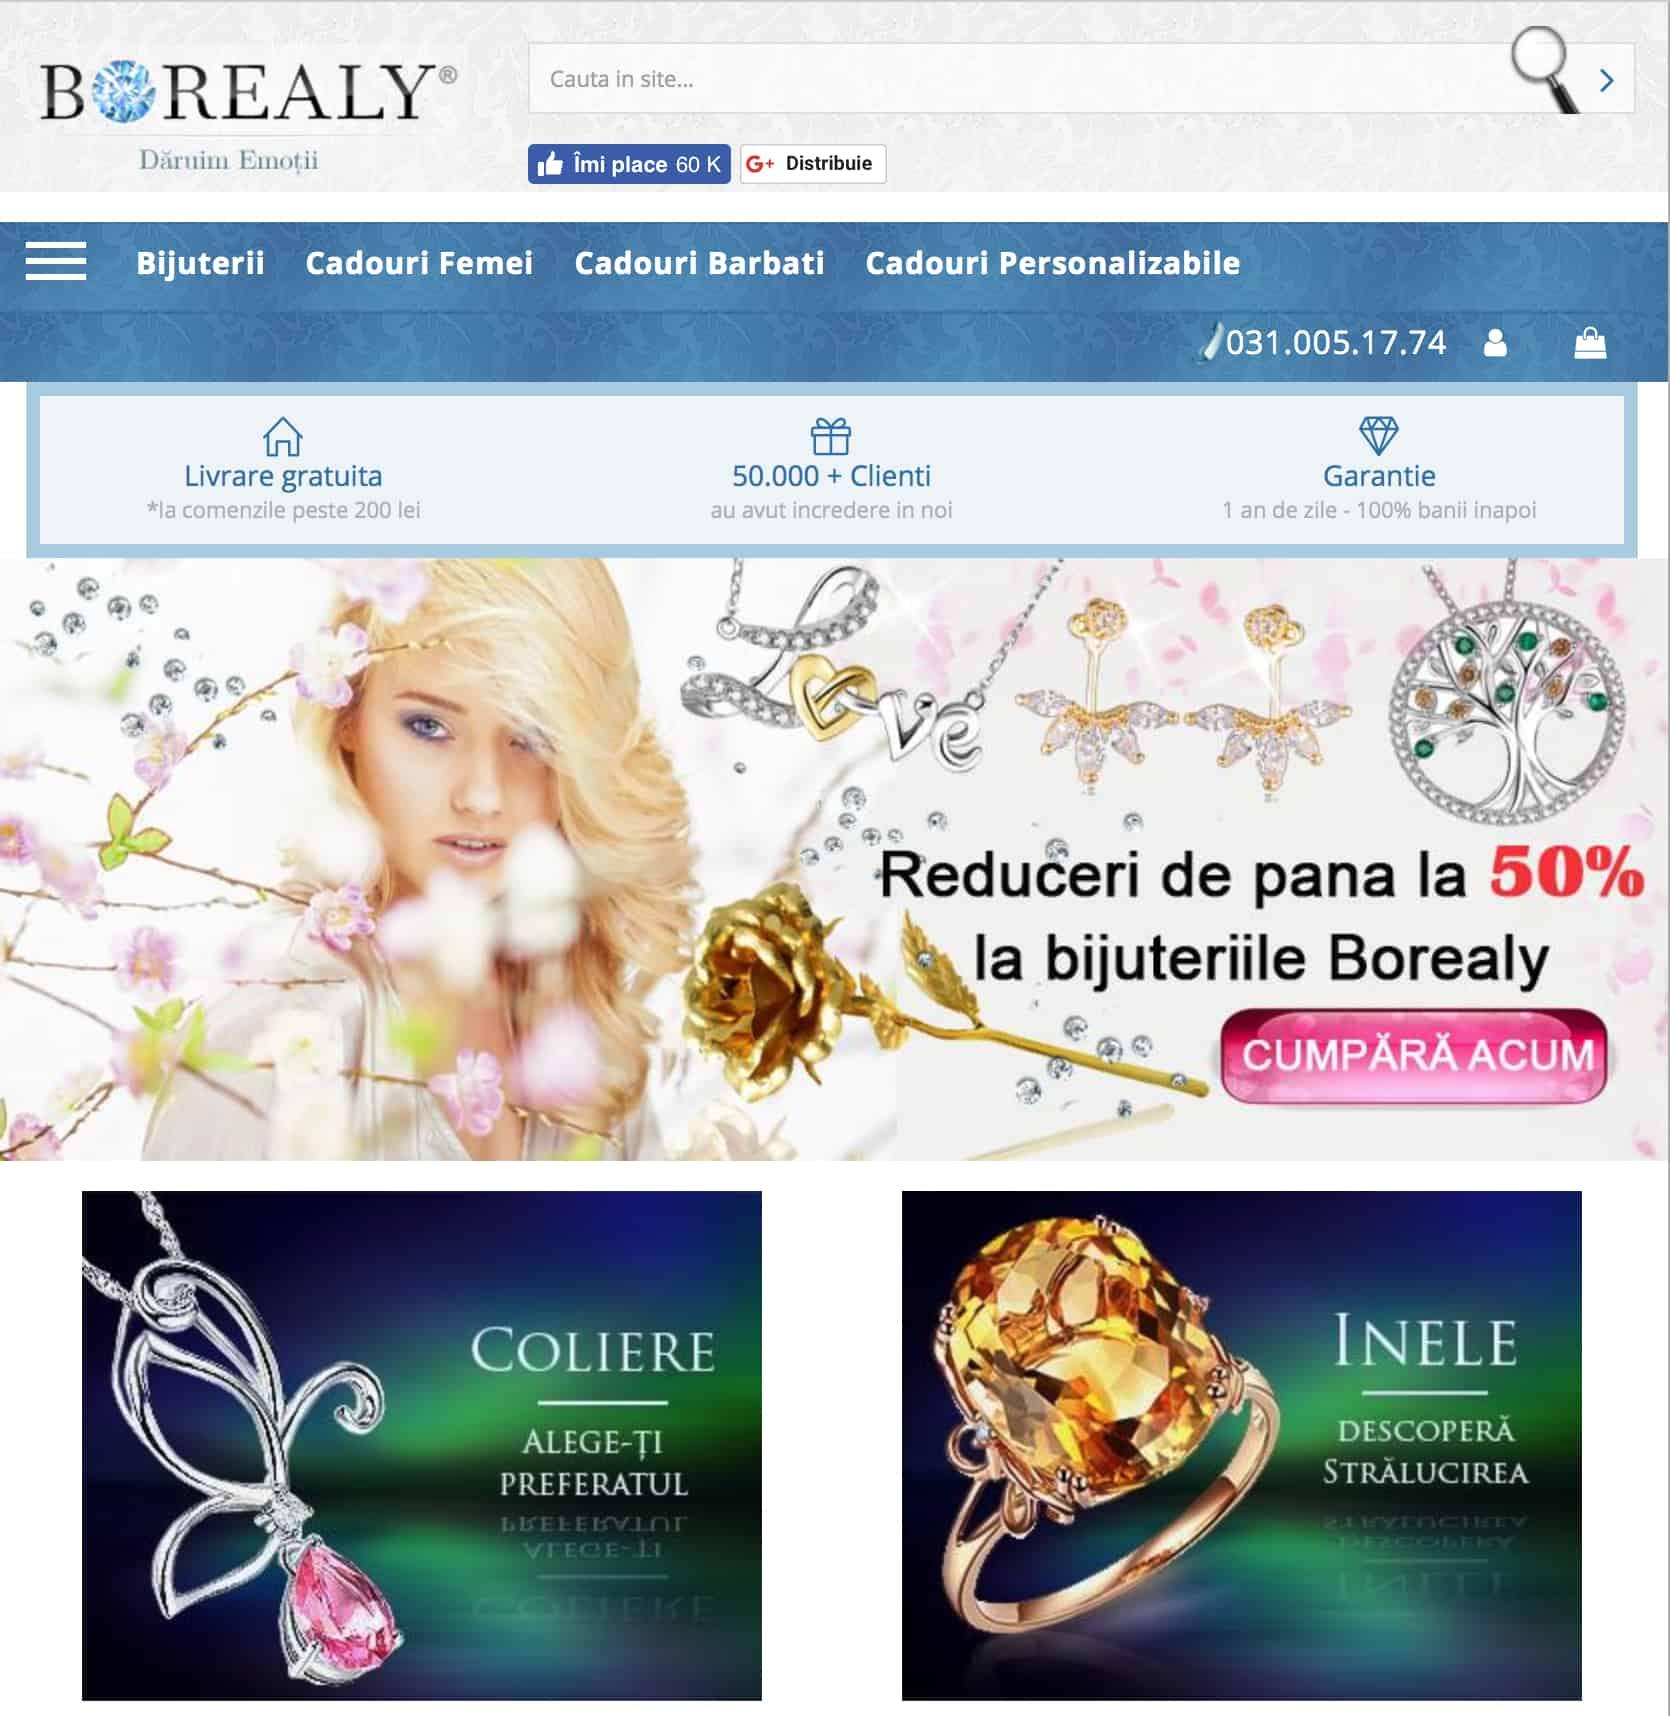 borealy_homepage